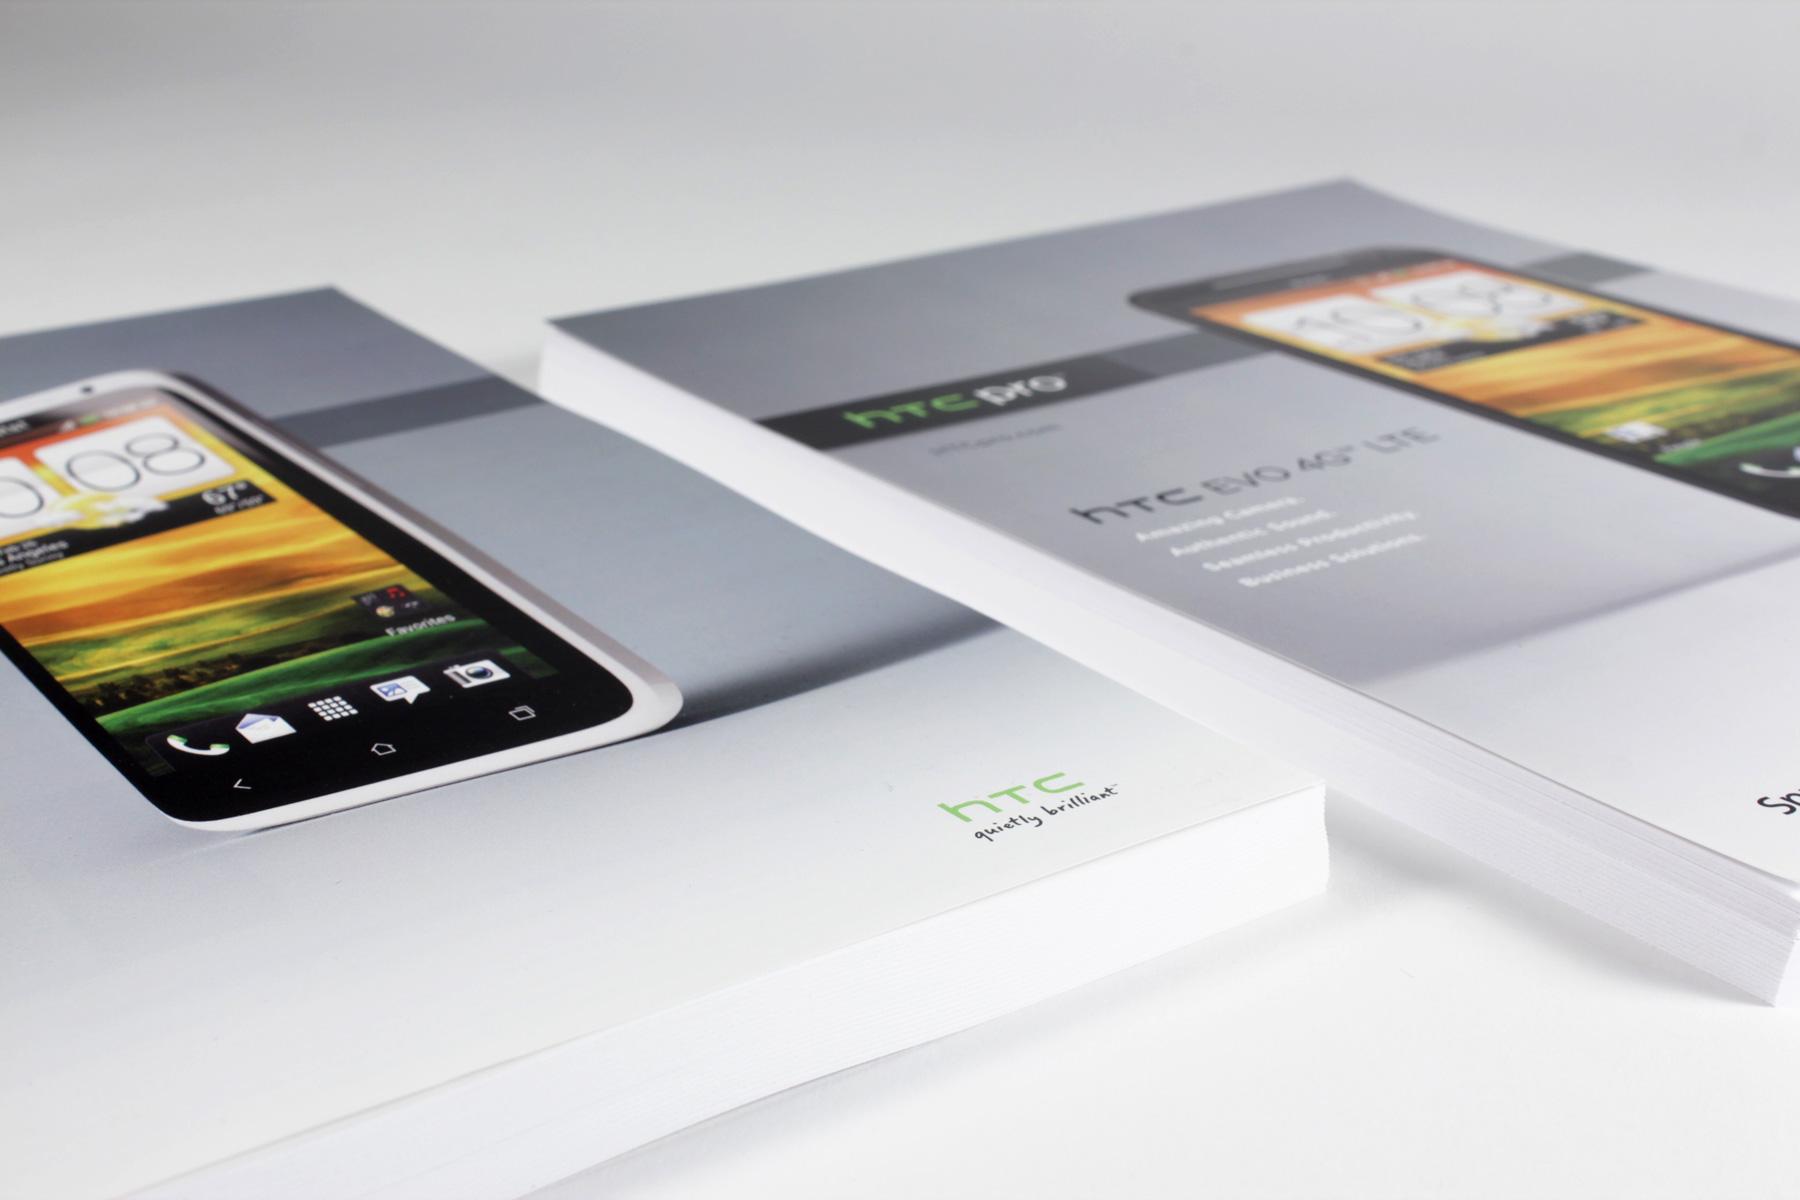 HTC Pro HTC Evo Model Manual